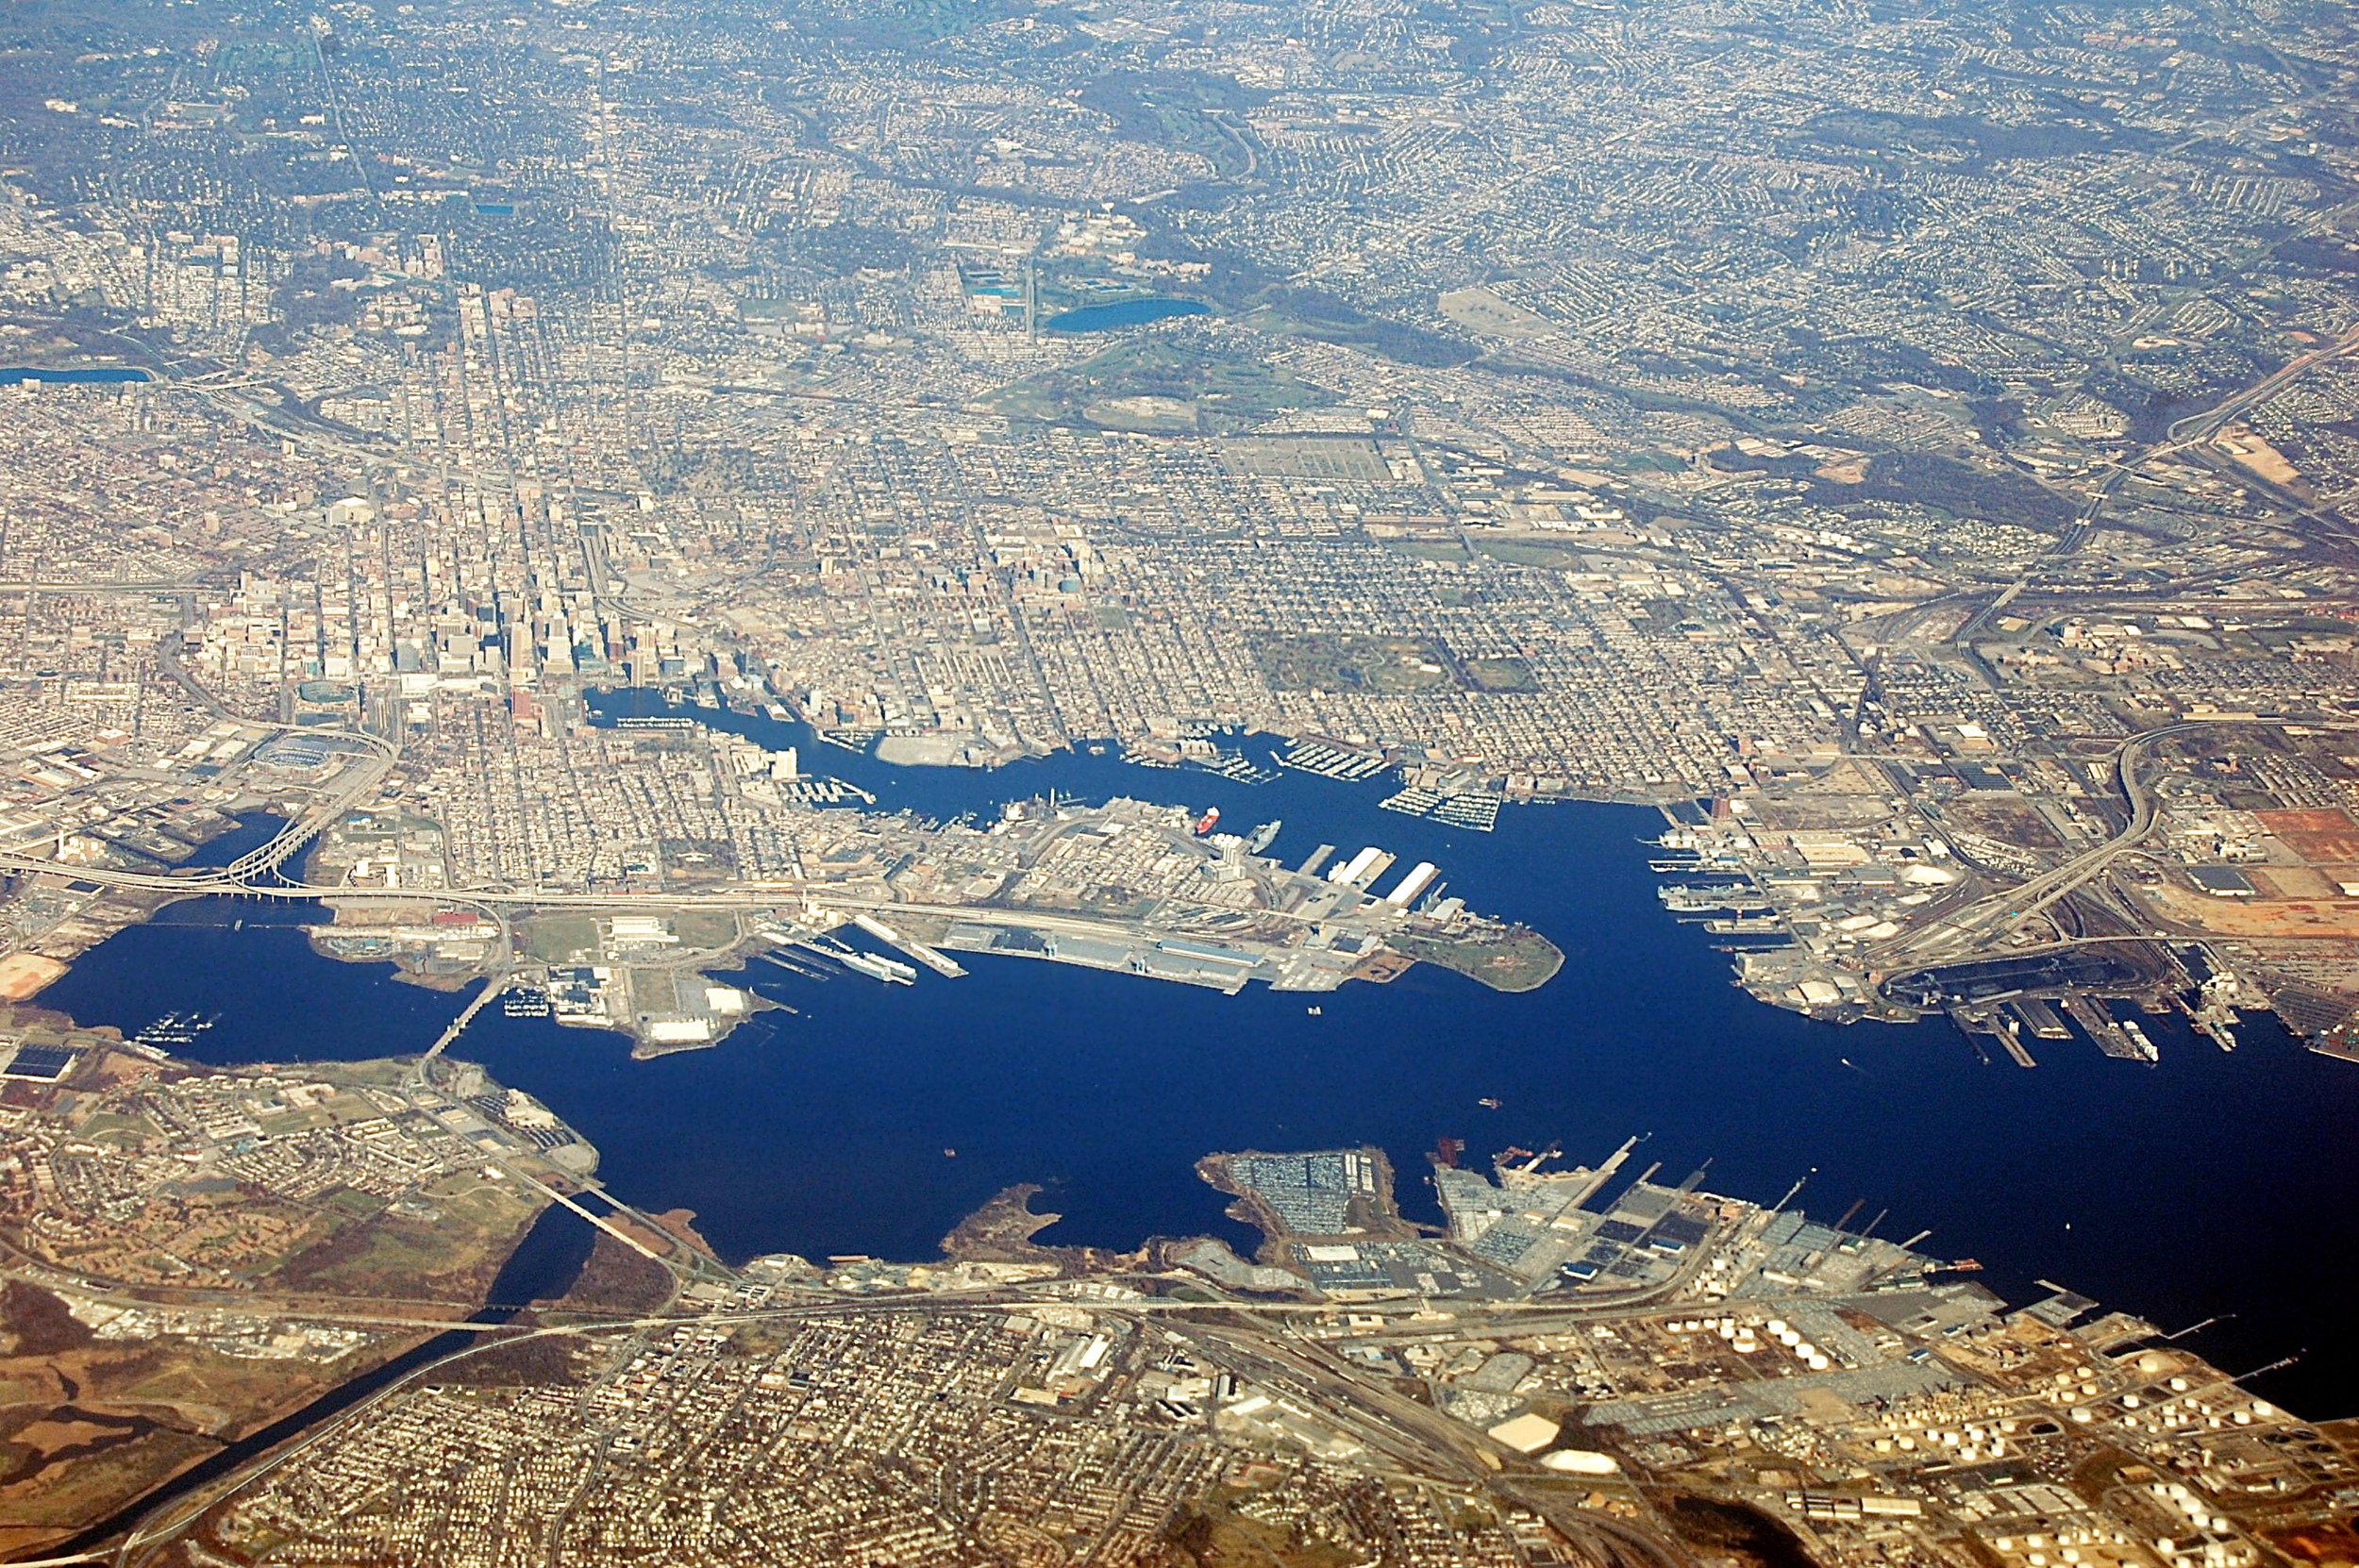 Baltimore, MD. Photo: Fletcher 6, Wikimedia Commons